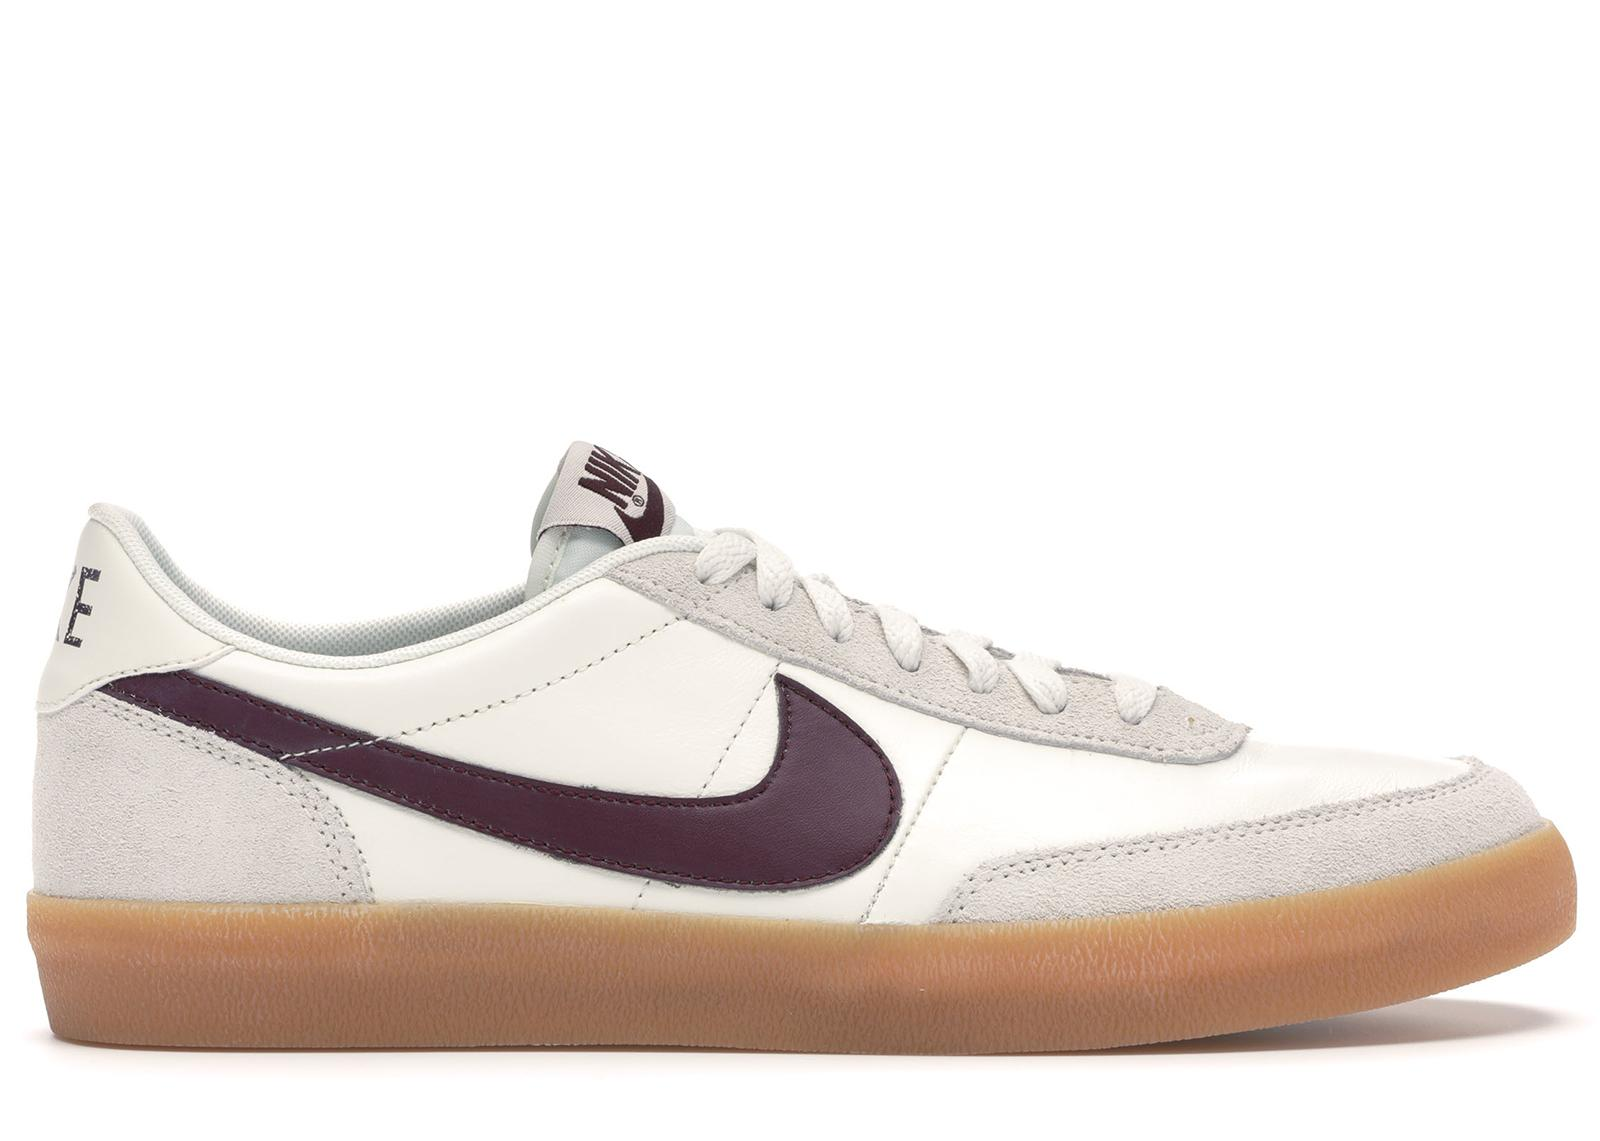 Nike Killshot 2 Night Maroon in White